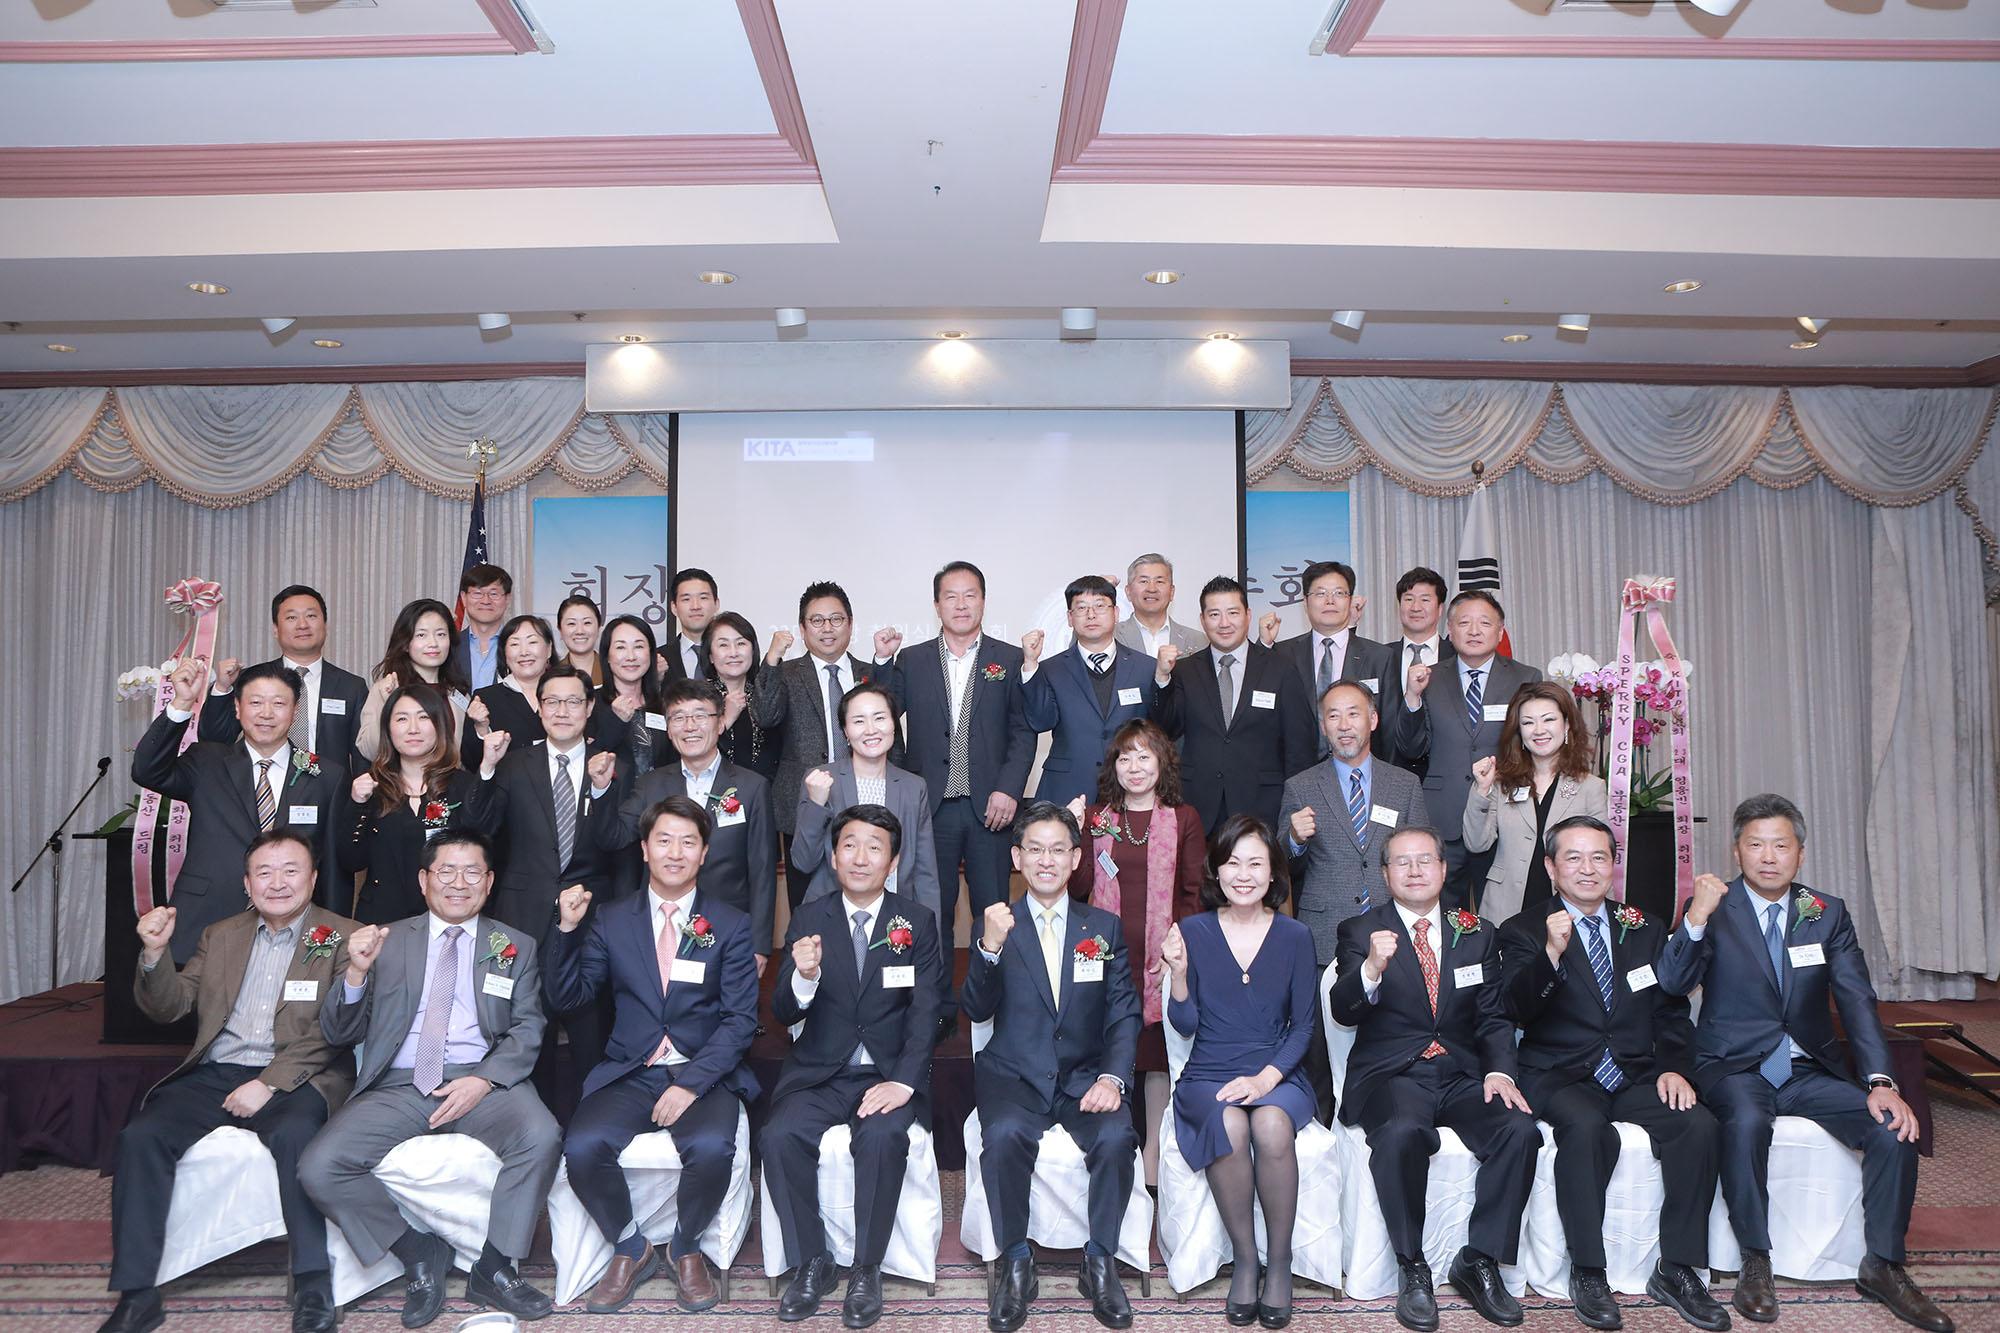 KITA 임웅빈 신임회장 취임식 및 총회 (2018년3월8일)